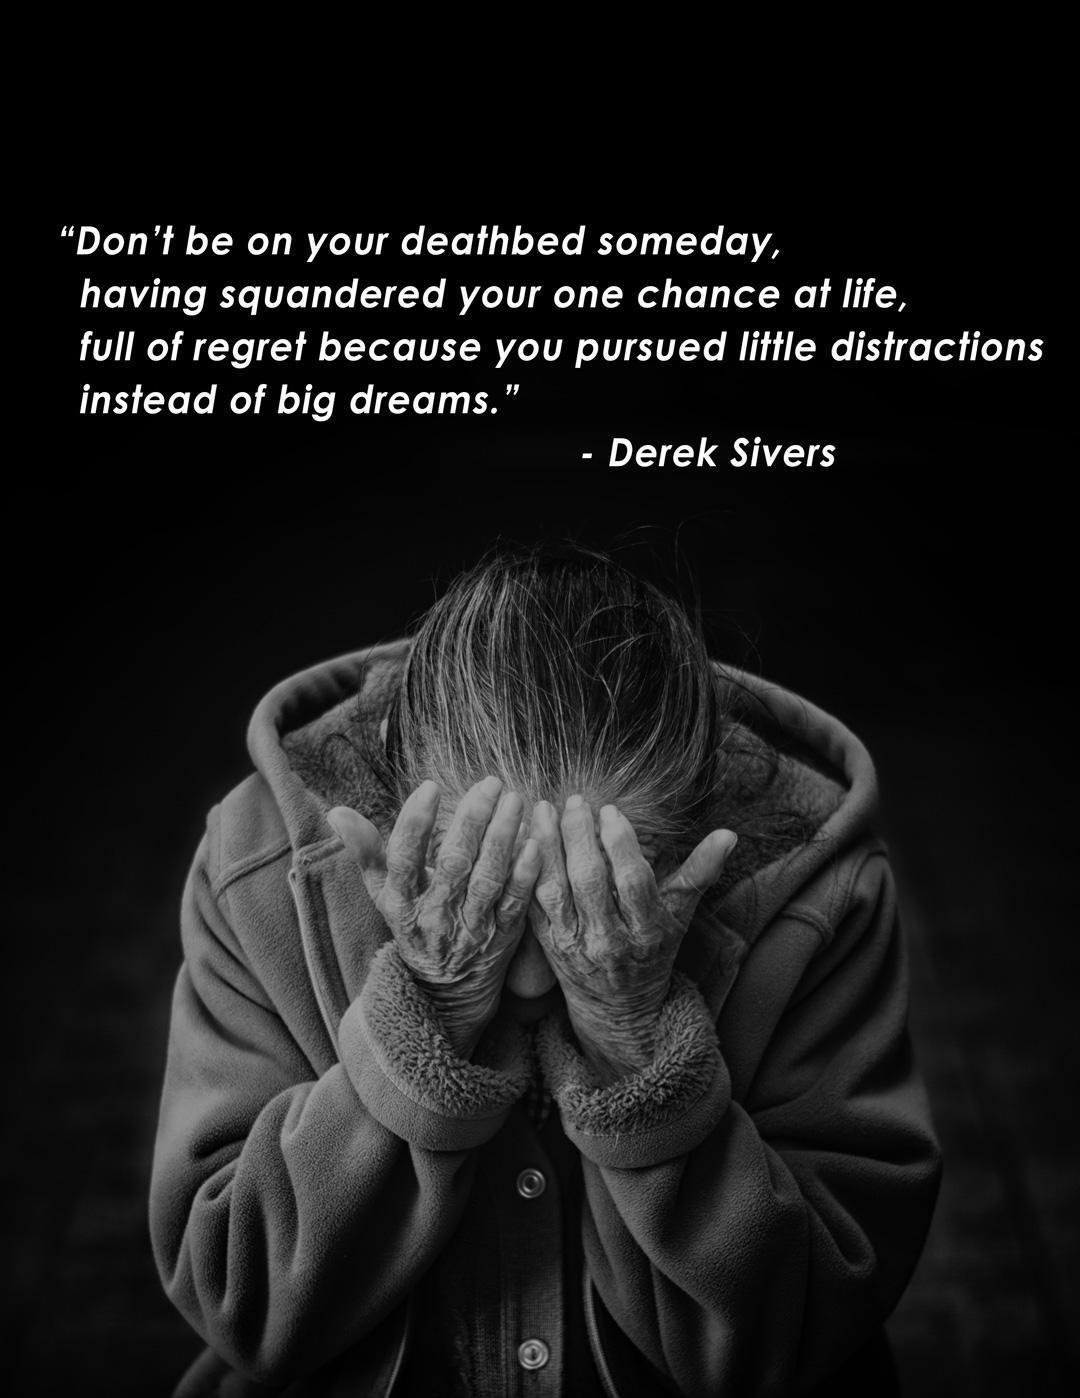 [Image] Don't pursue little distractions.